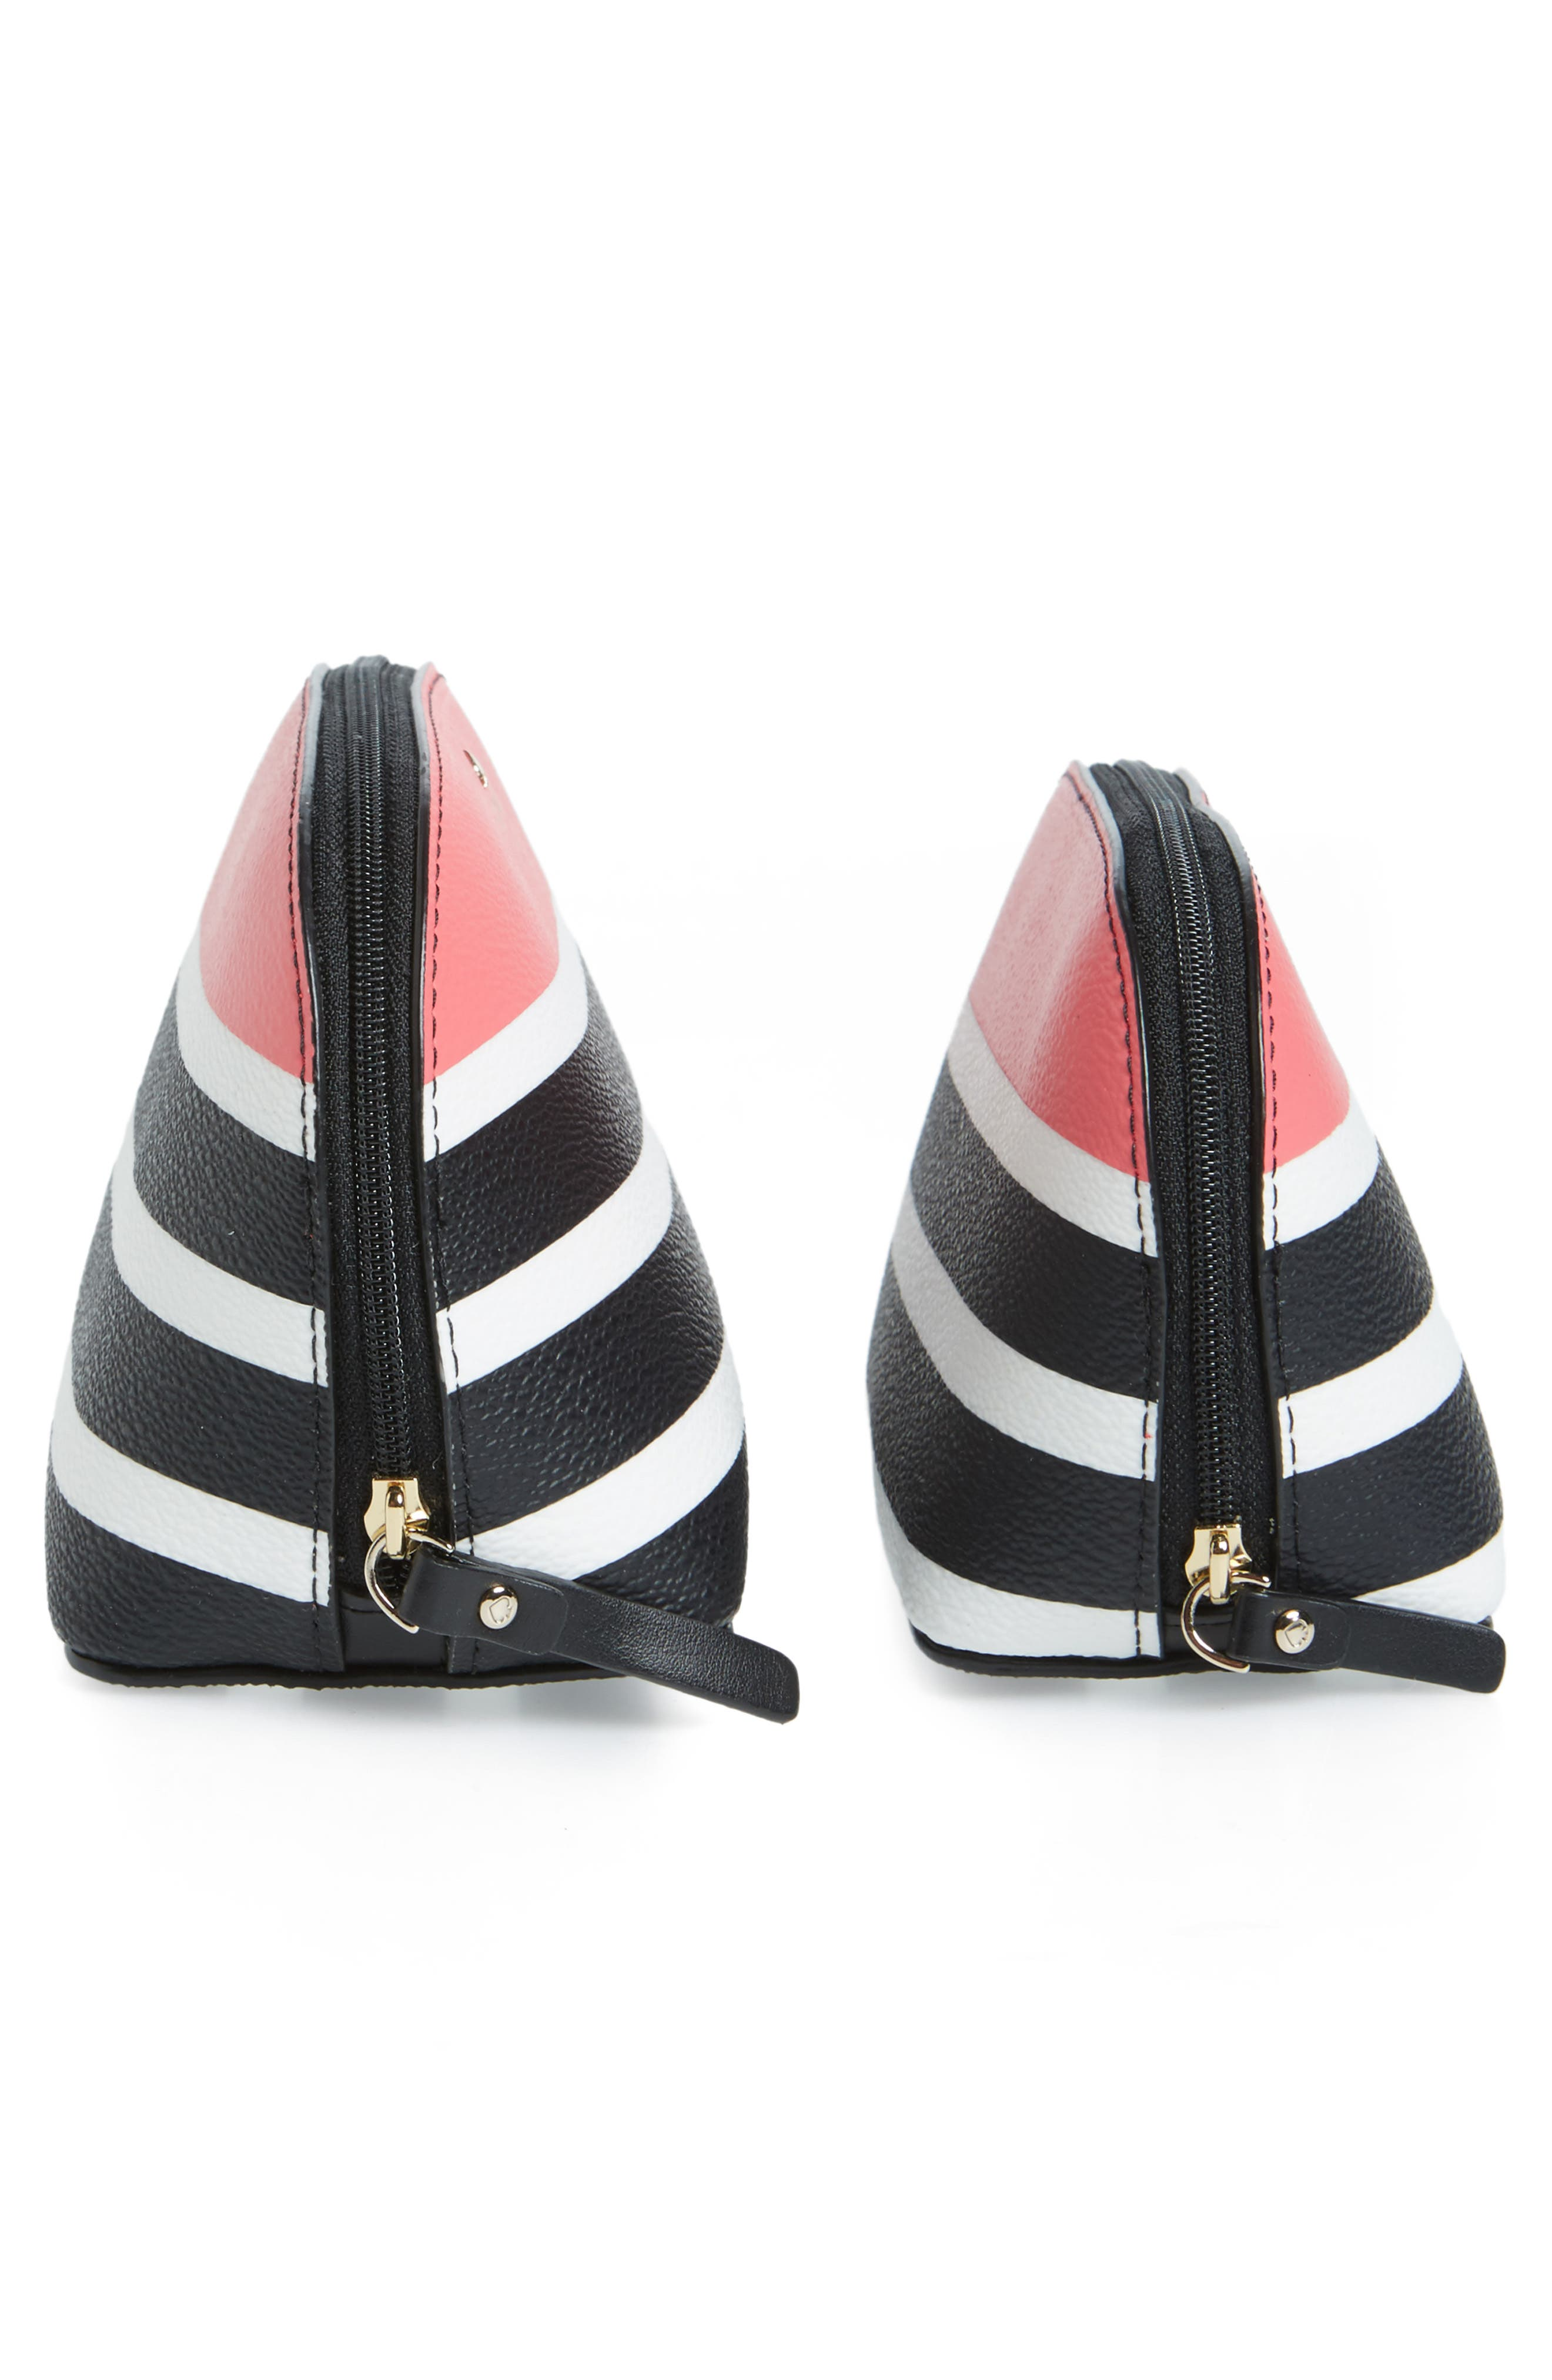 hyde lane stripe abalene set of 2 faux leather pouches,                             Alternate thumbnail 4, color,                             001